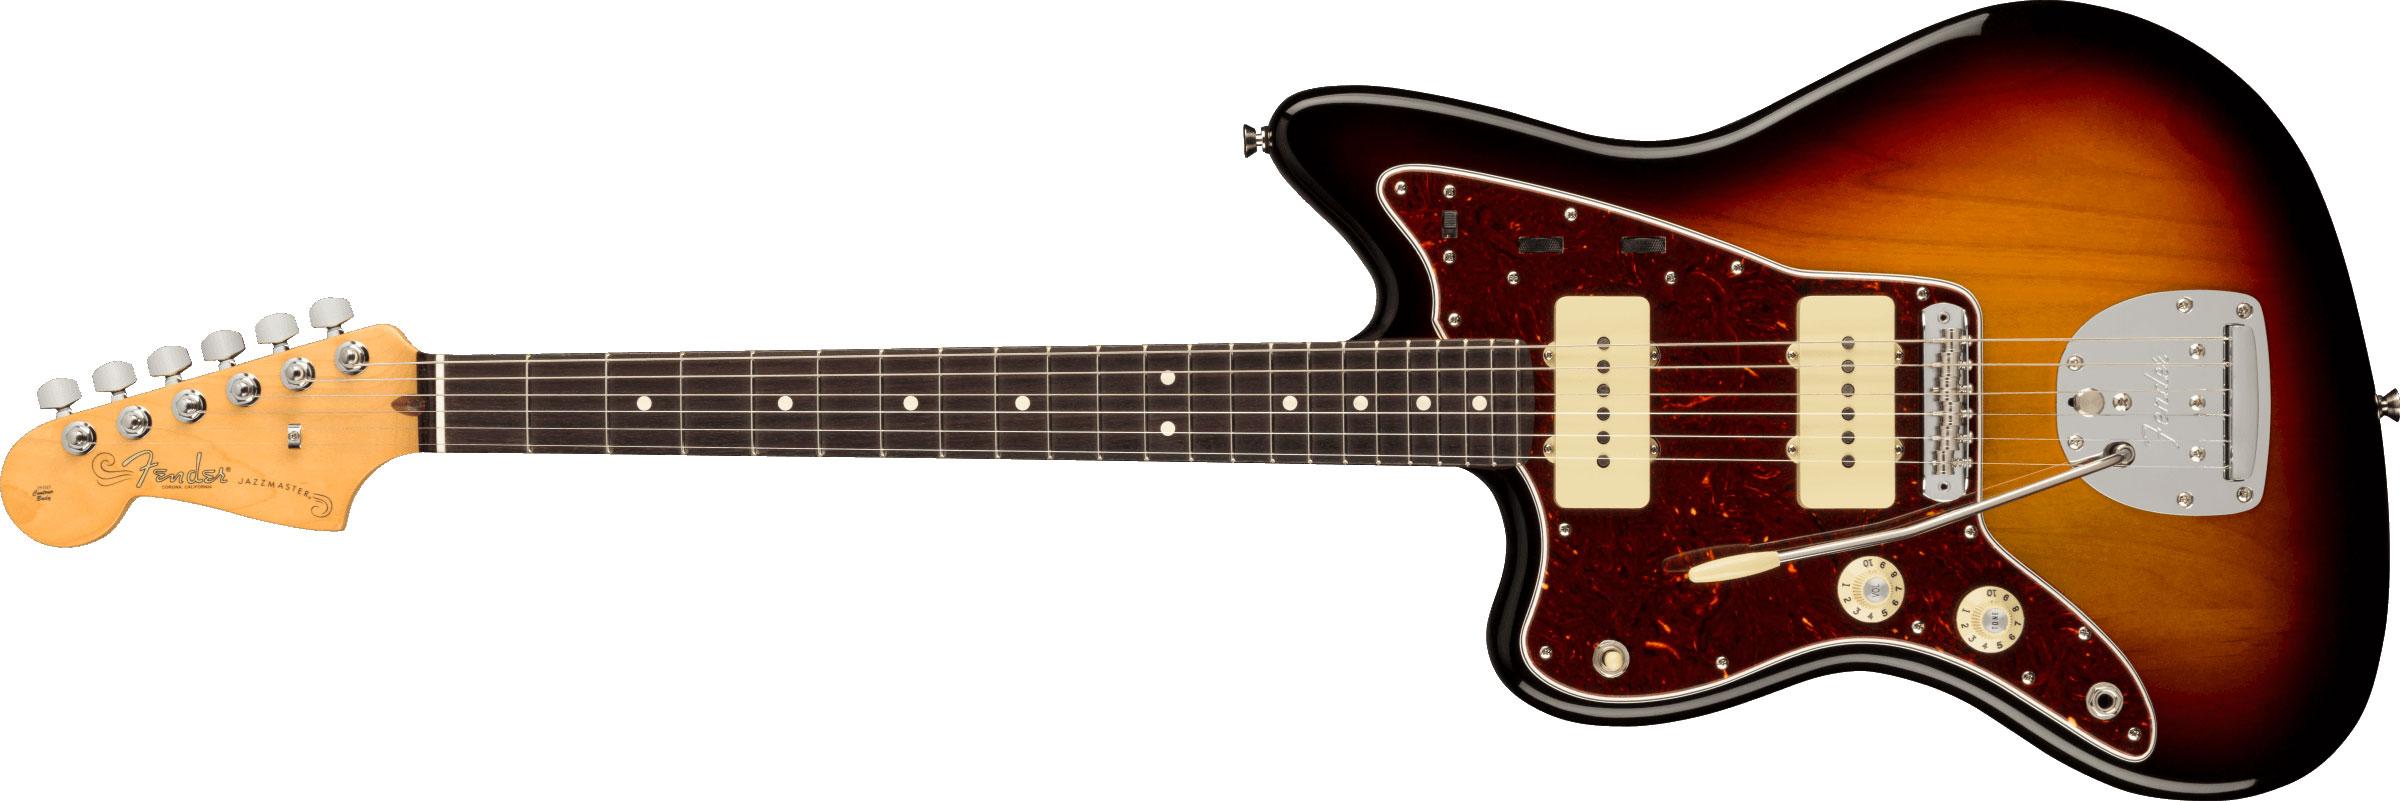 American Professional II Jazzmaster Left-Handed (2020-) 画像1